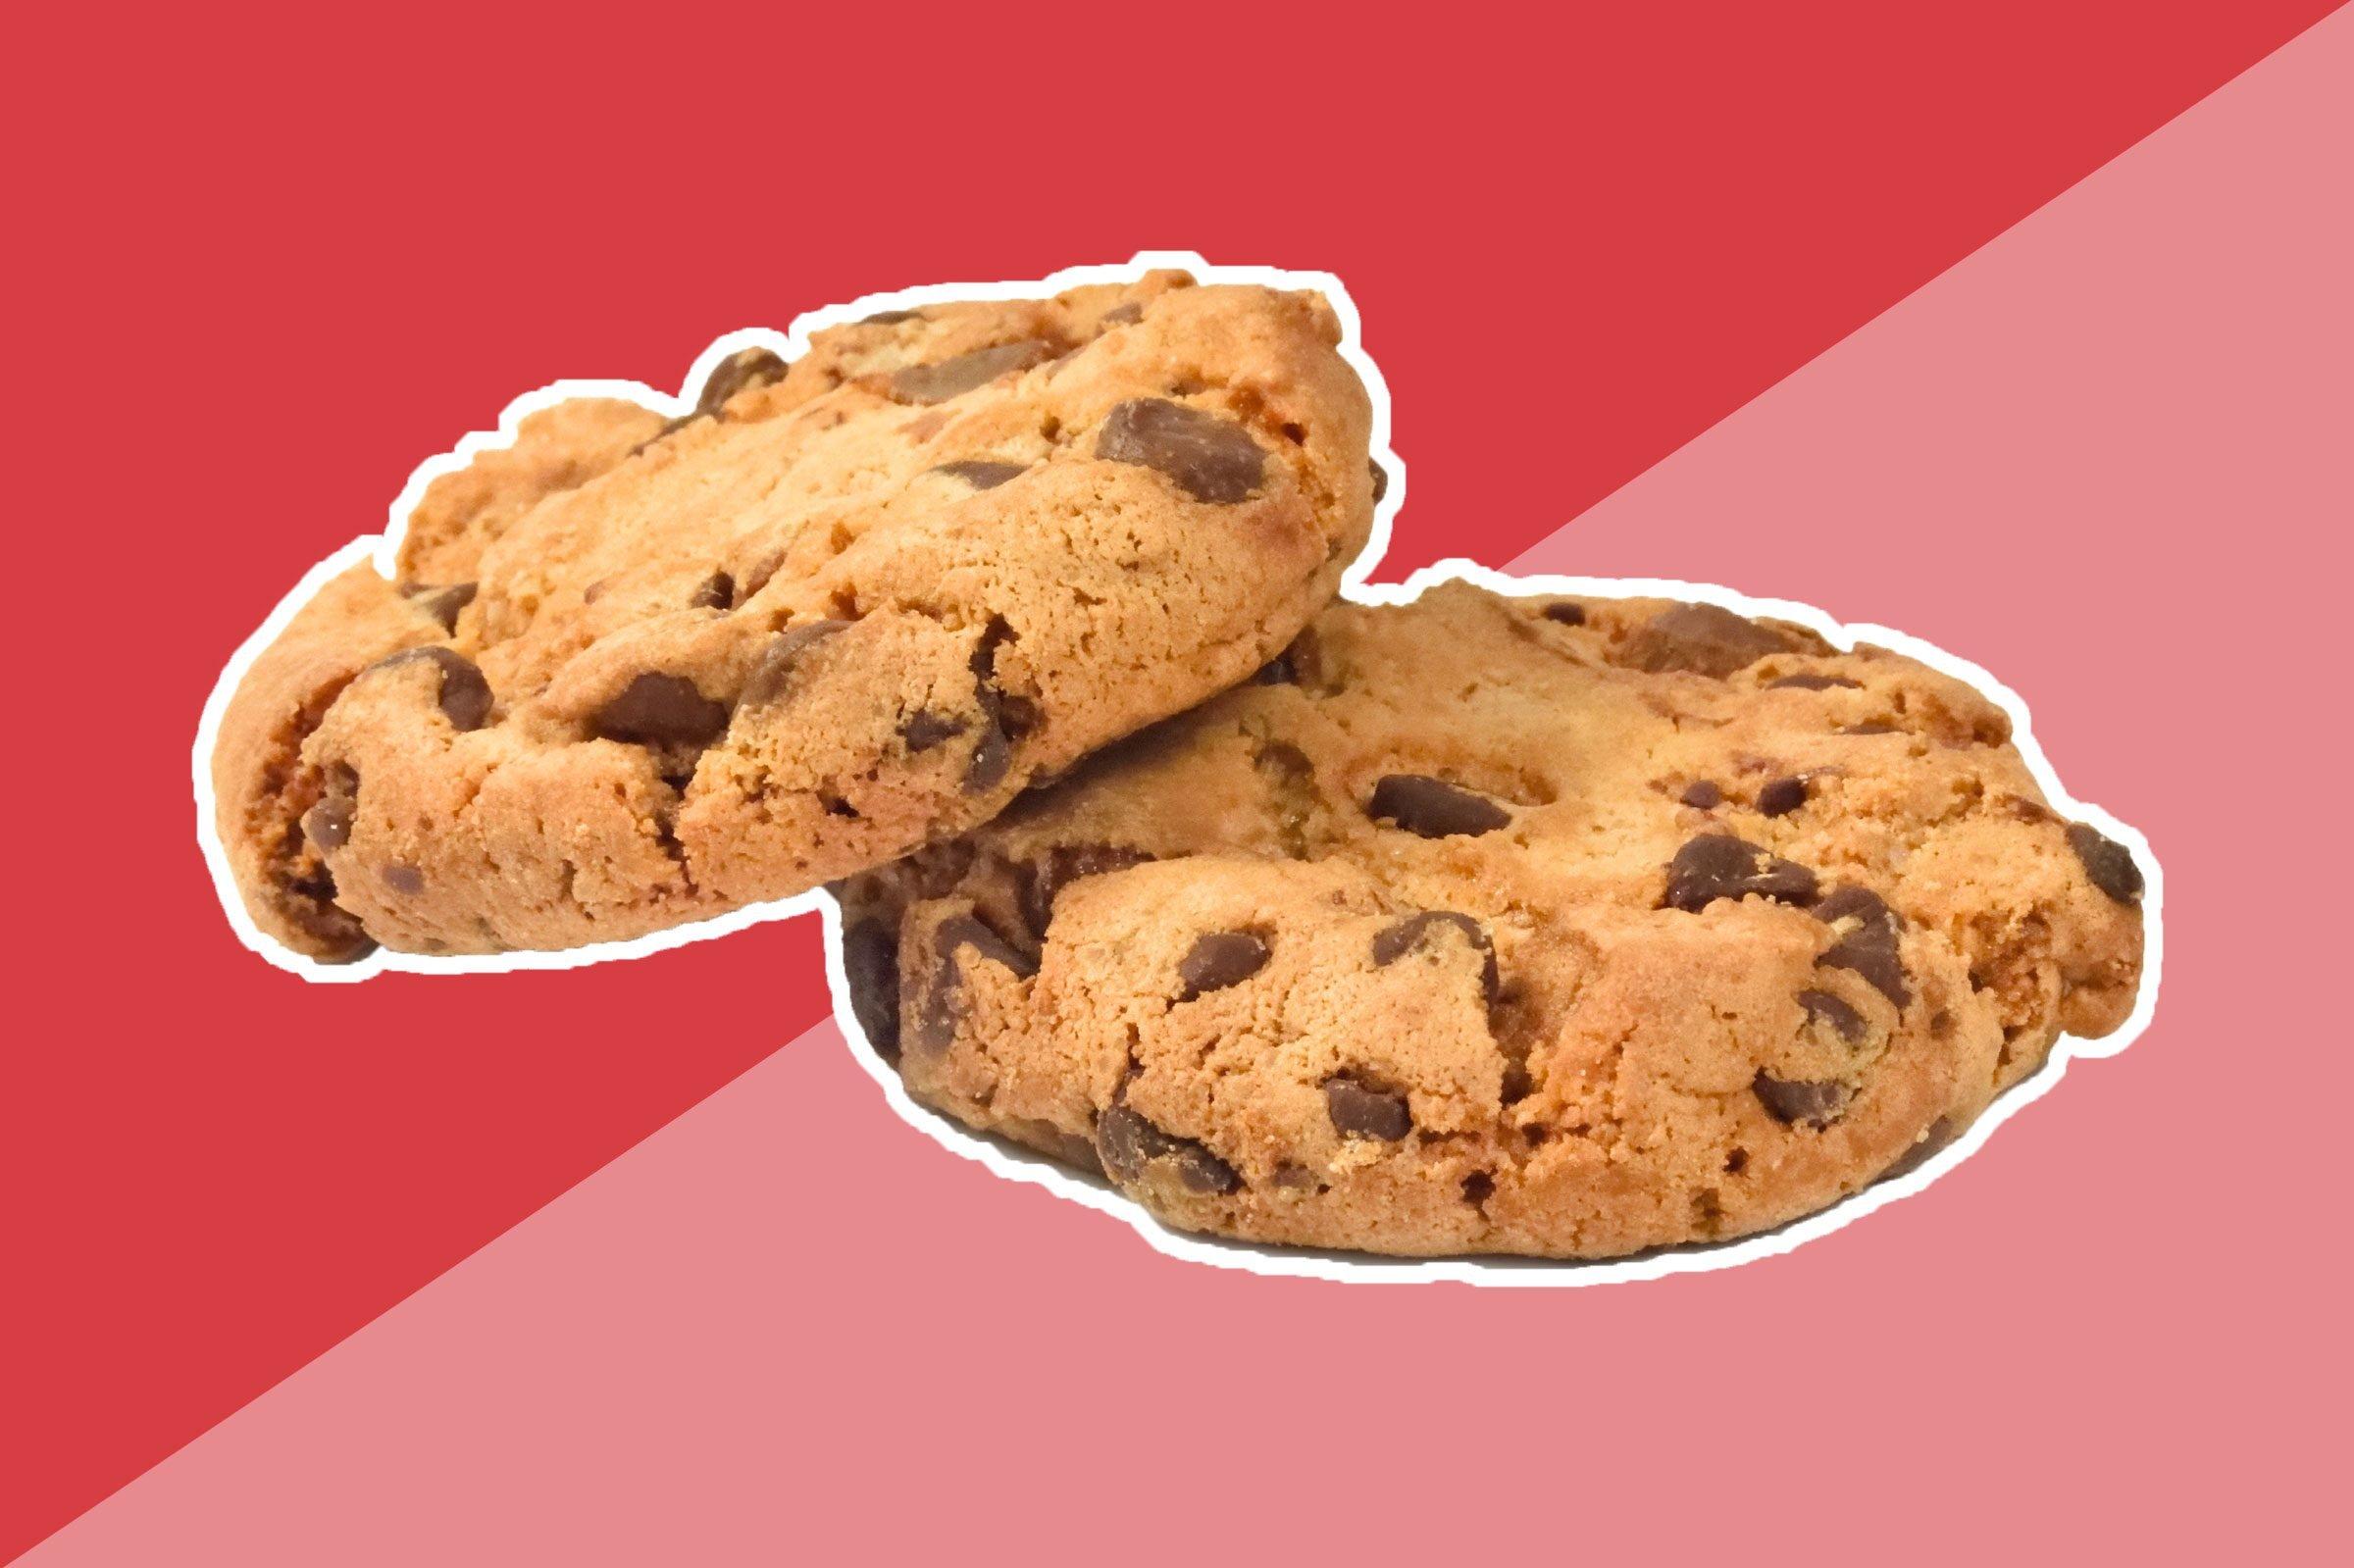 Gluten-free baked goods